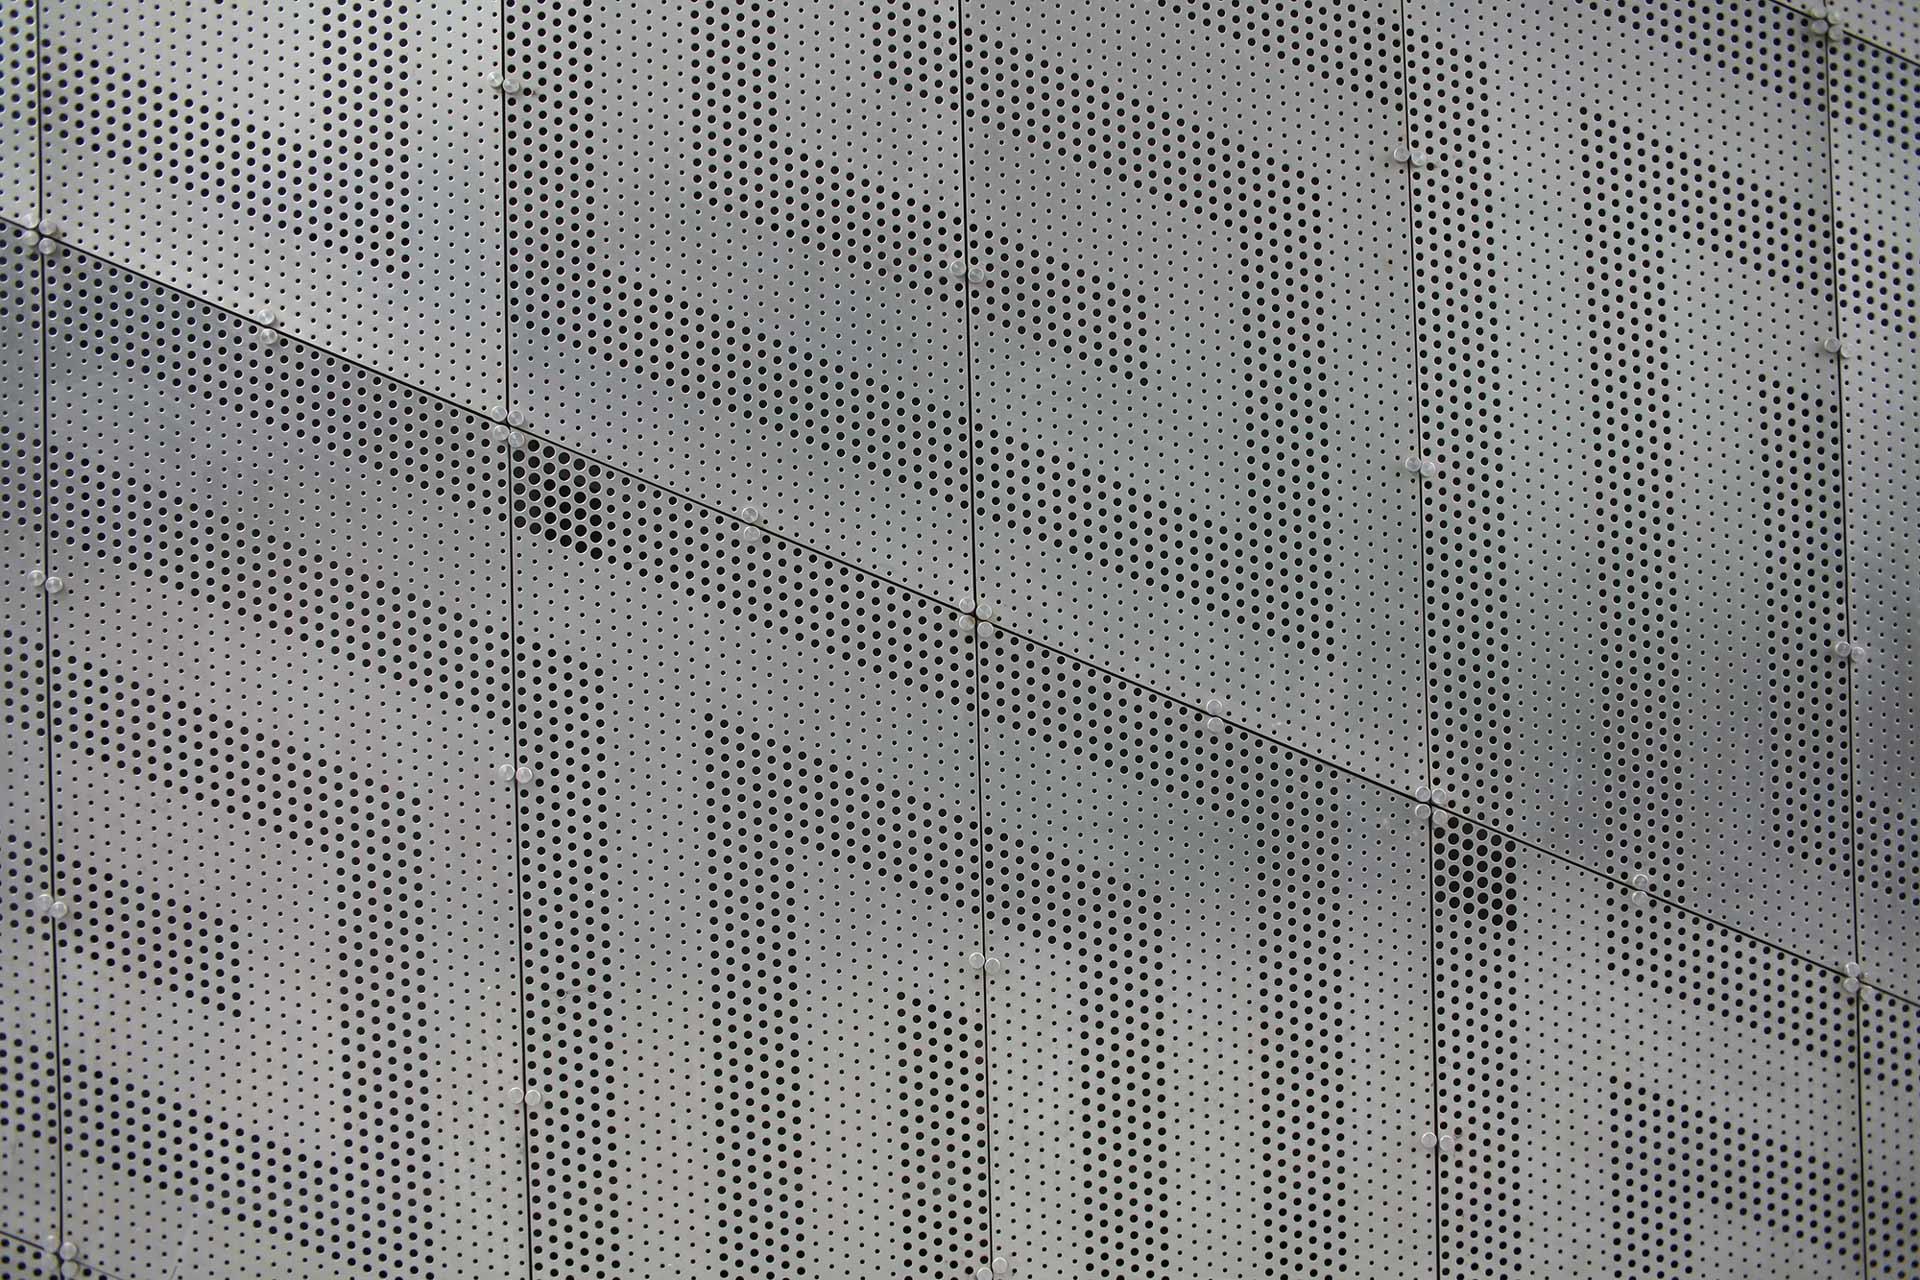 Park-Five_Klopfer-Martin-Design-Group_metal-texture_perforation-pattern.jpg